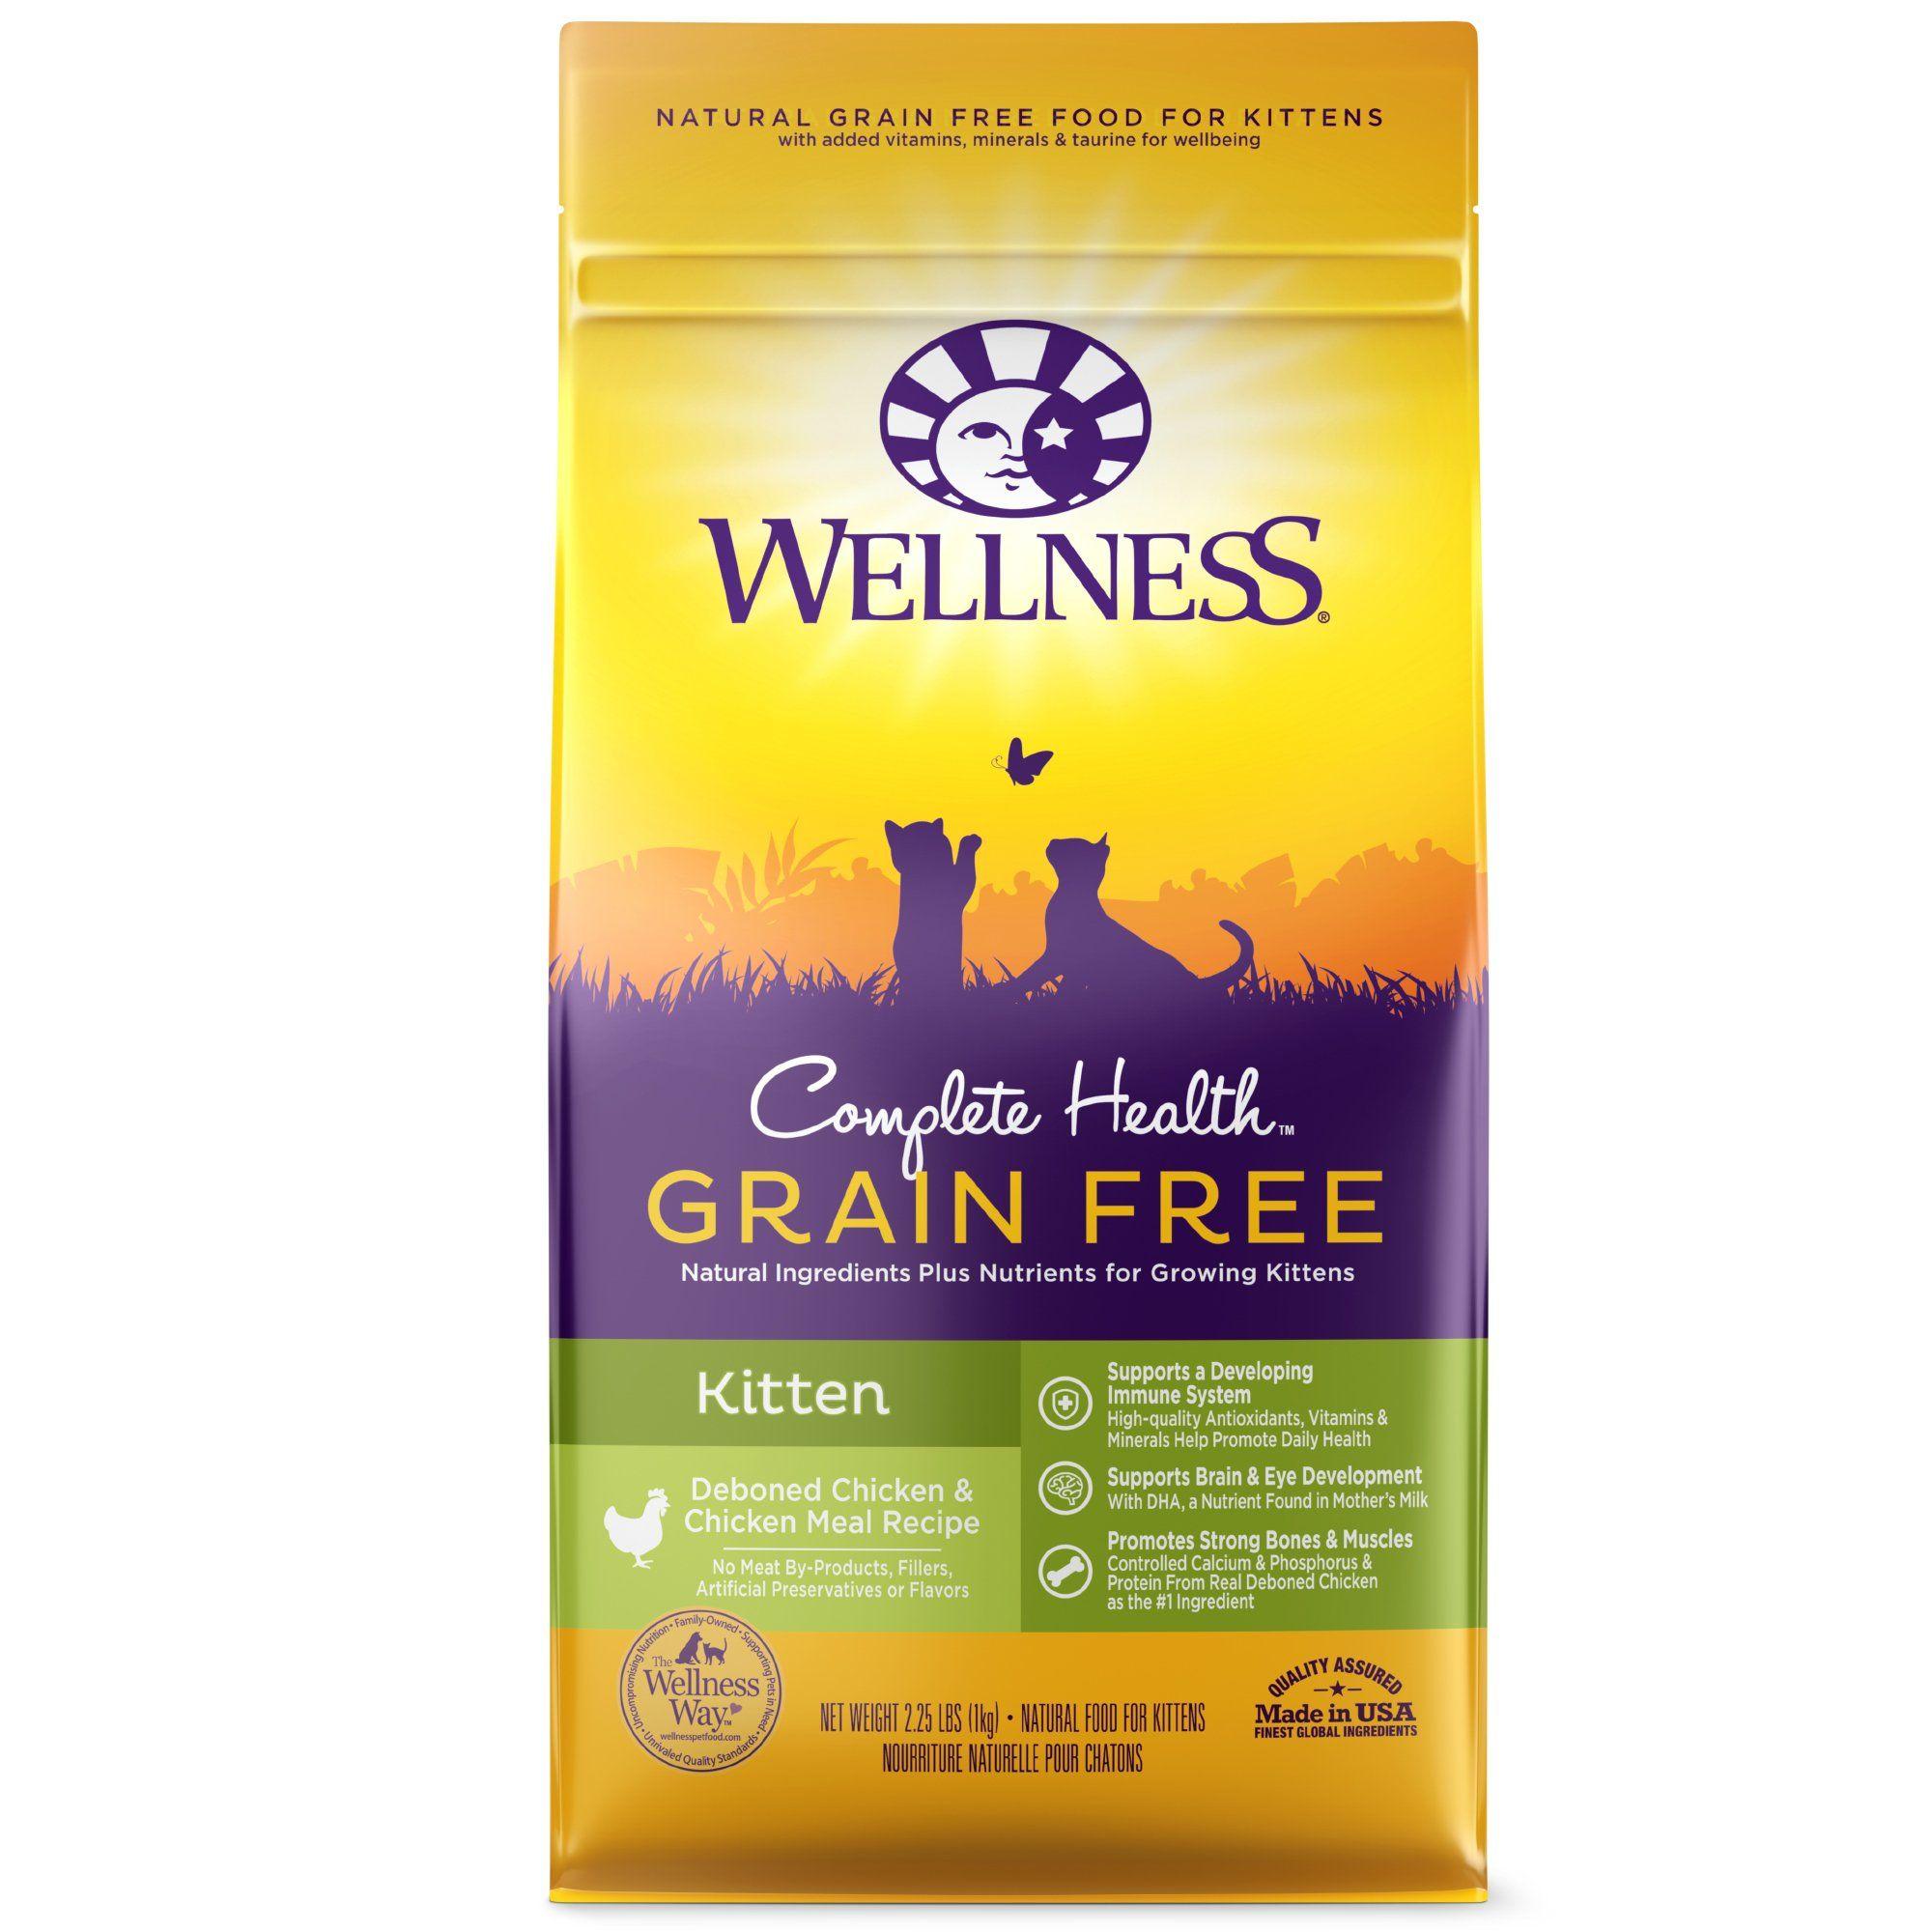 Wellness Complete Health Natural Grain Free Deboned Chicken